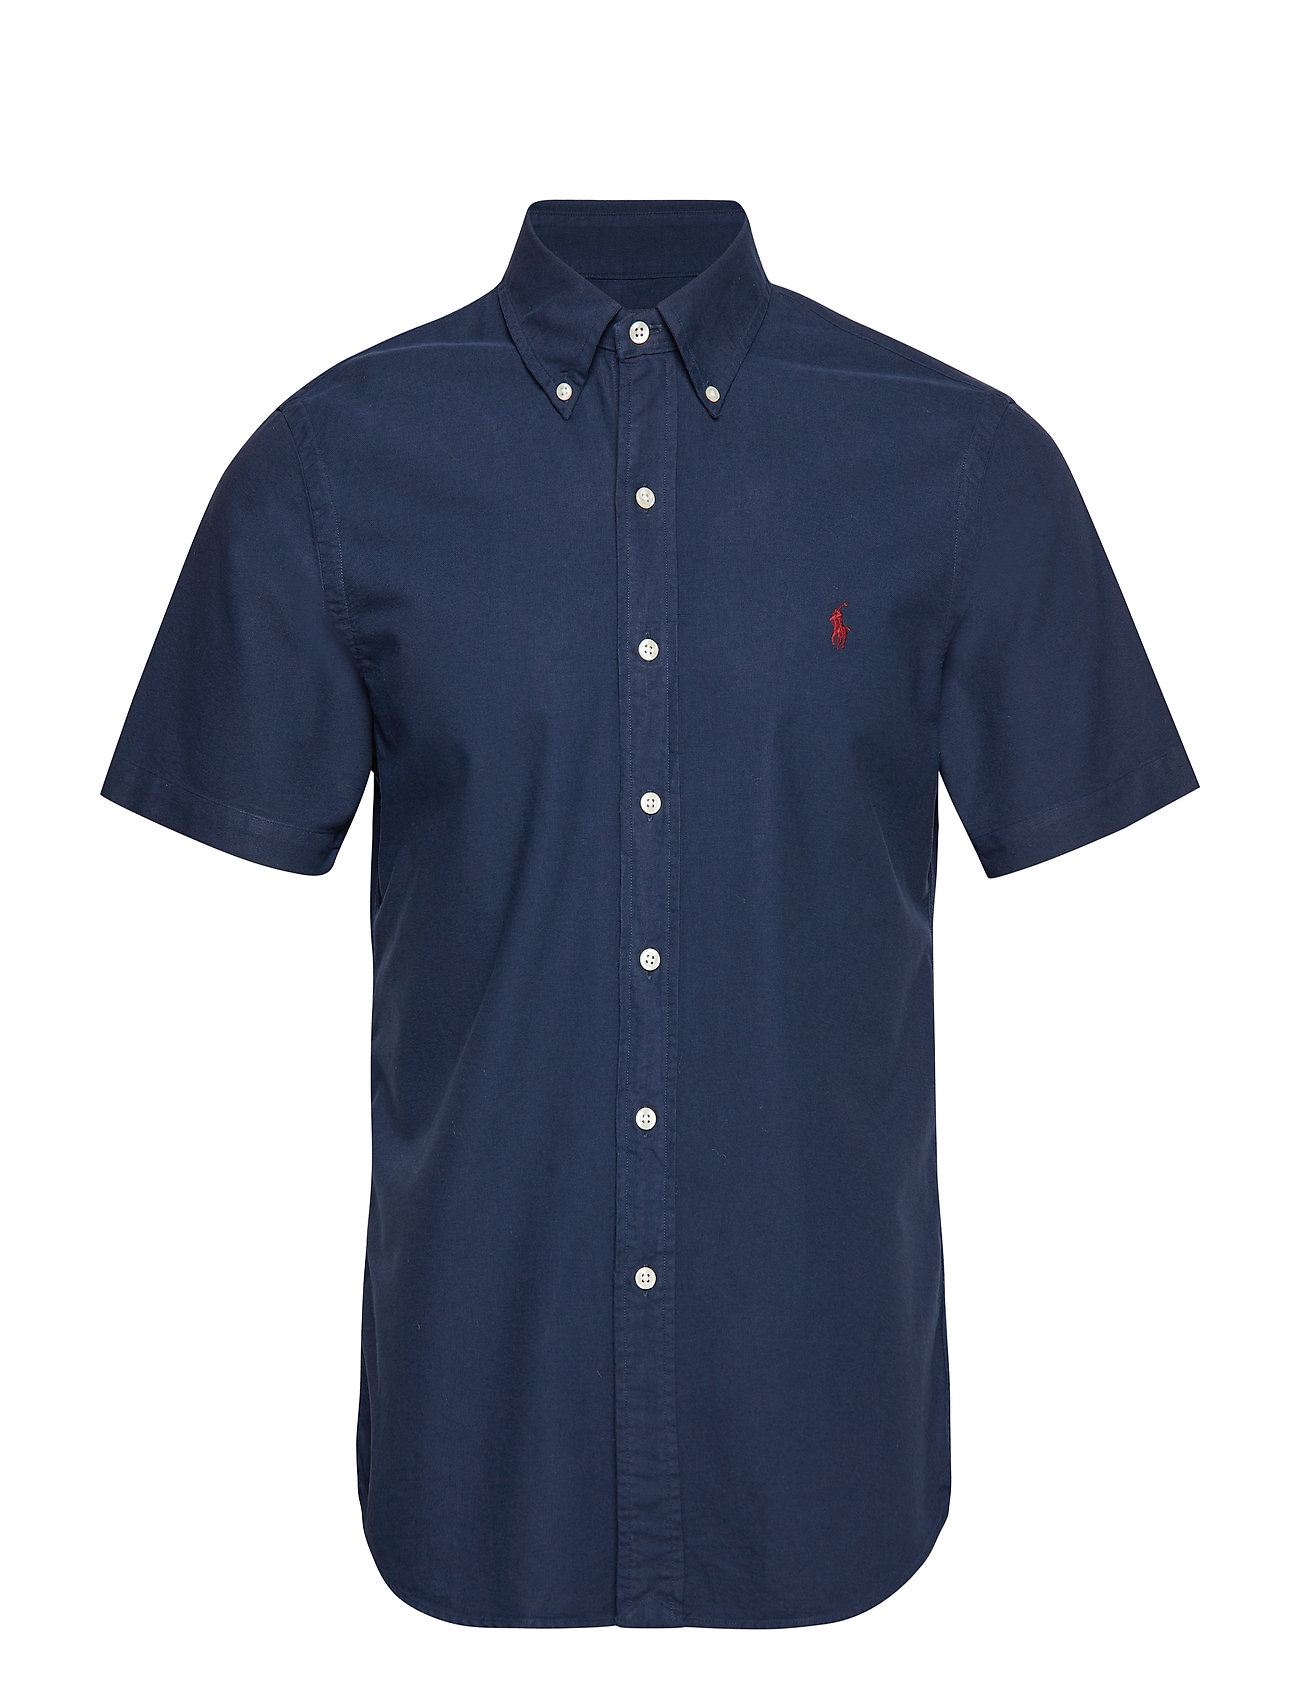 Polo Ralph Lauren Slim Fit Oxford Shirt - CRUISE NAVY